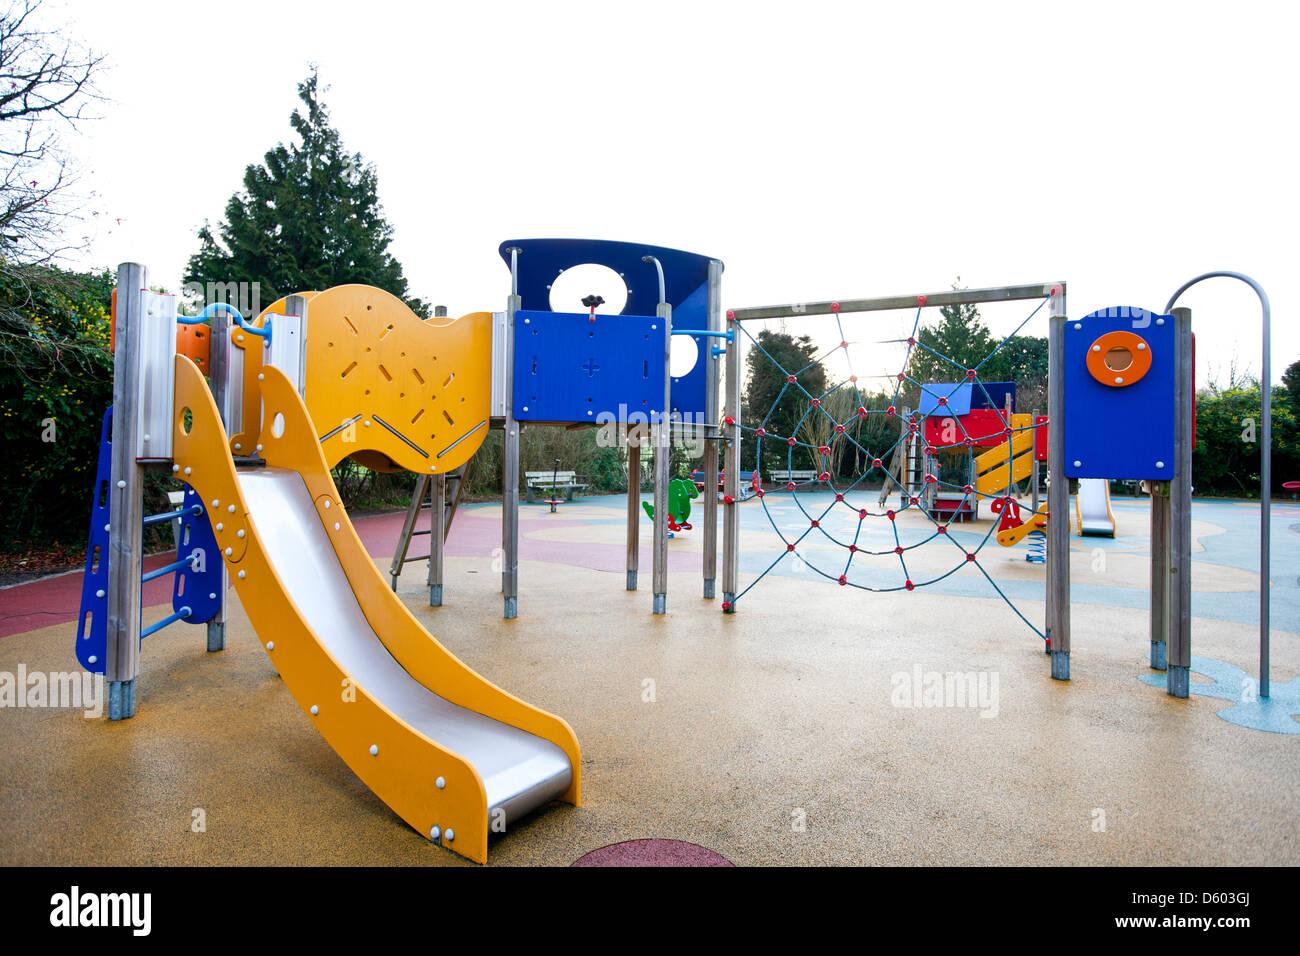 Slide climbing web in children's playground - Stock Image